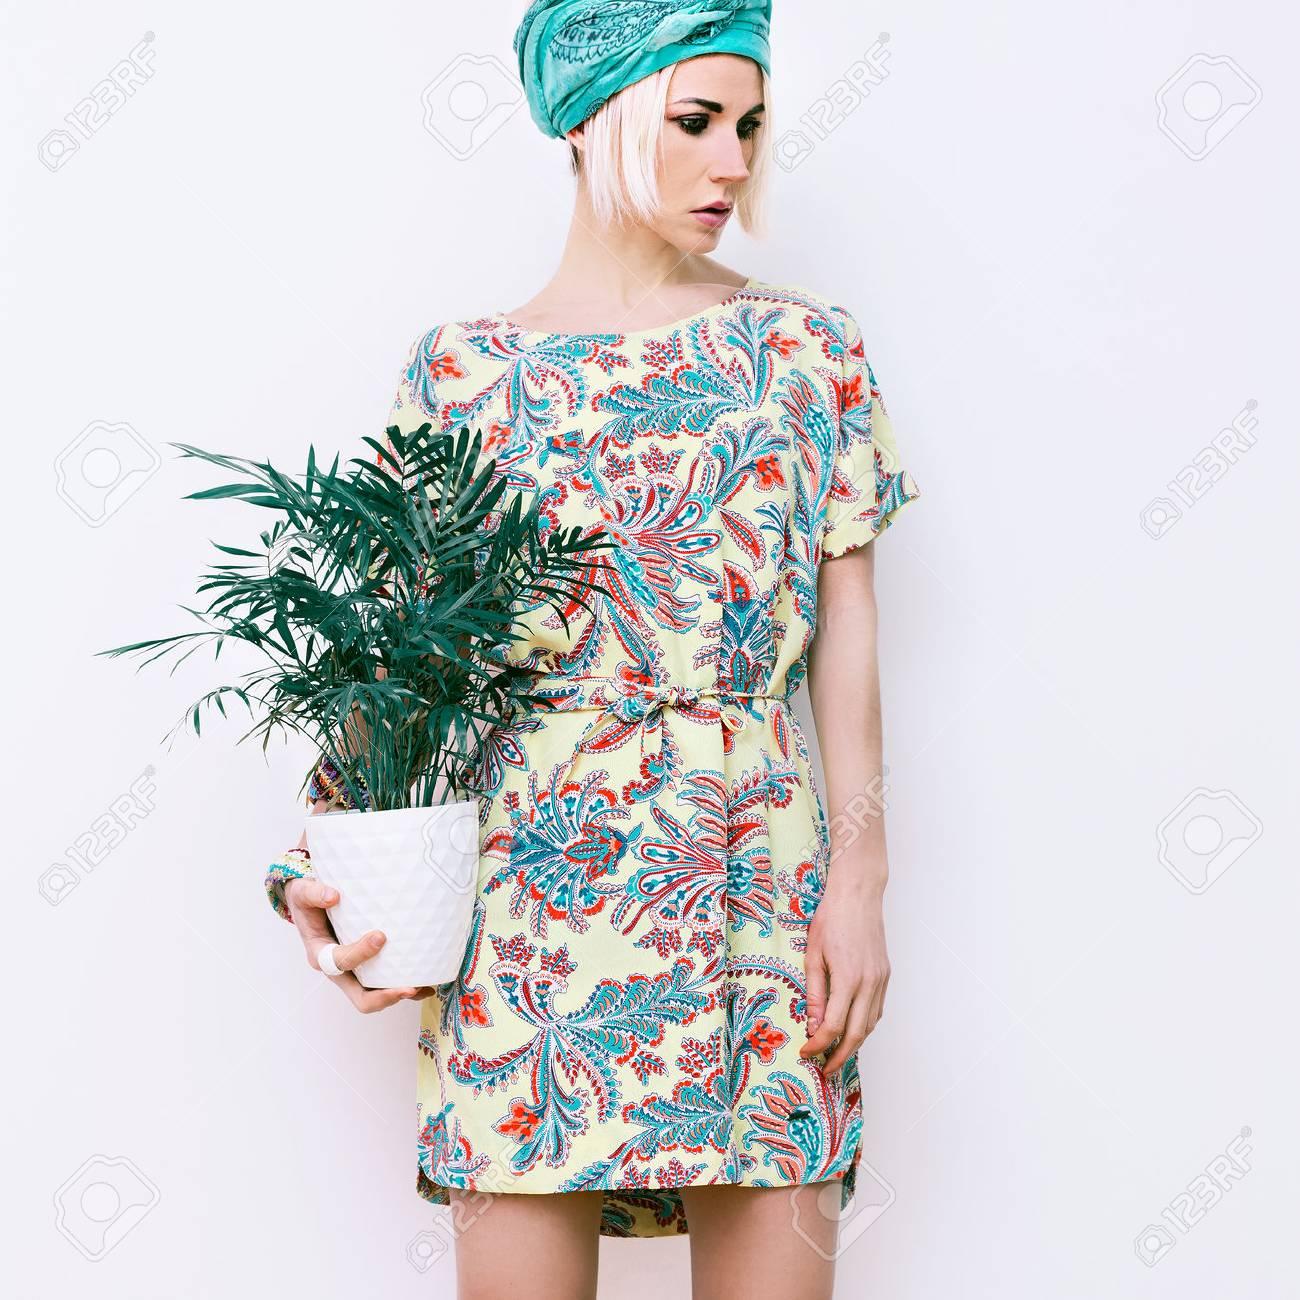 Model with flower in trendy summer dress - 40336085